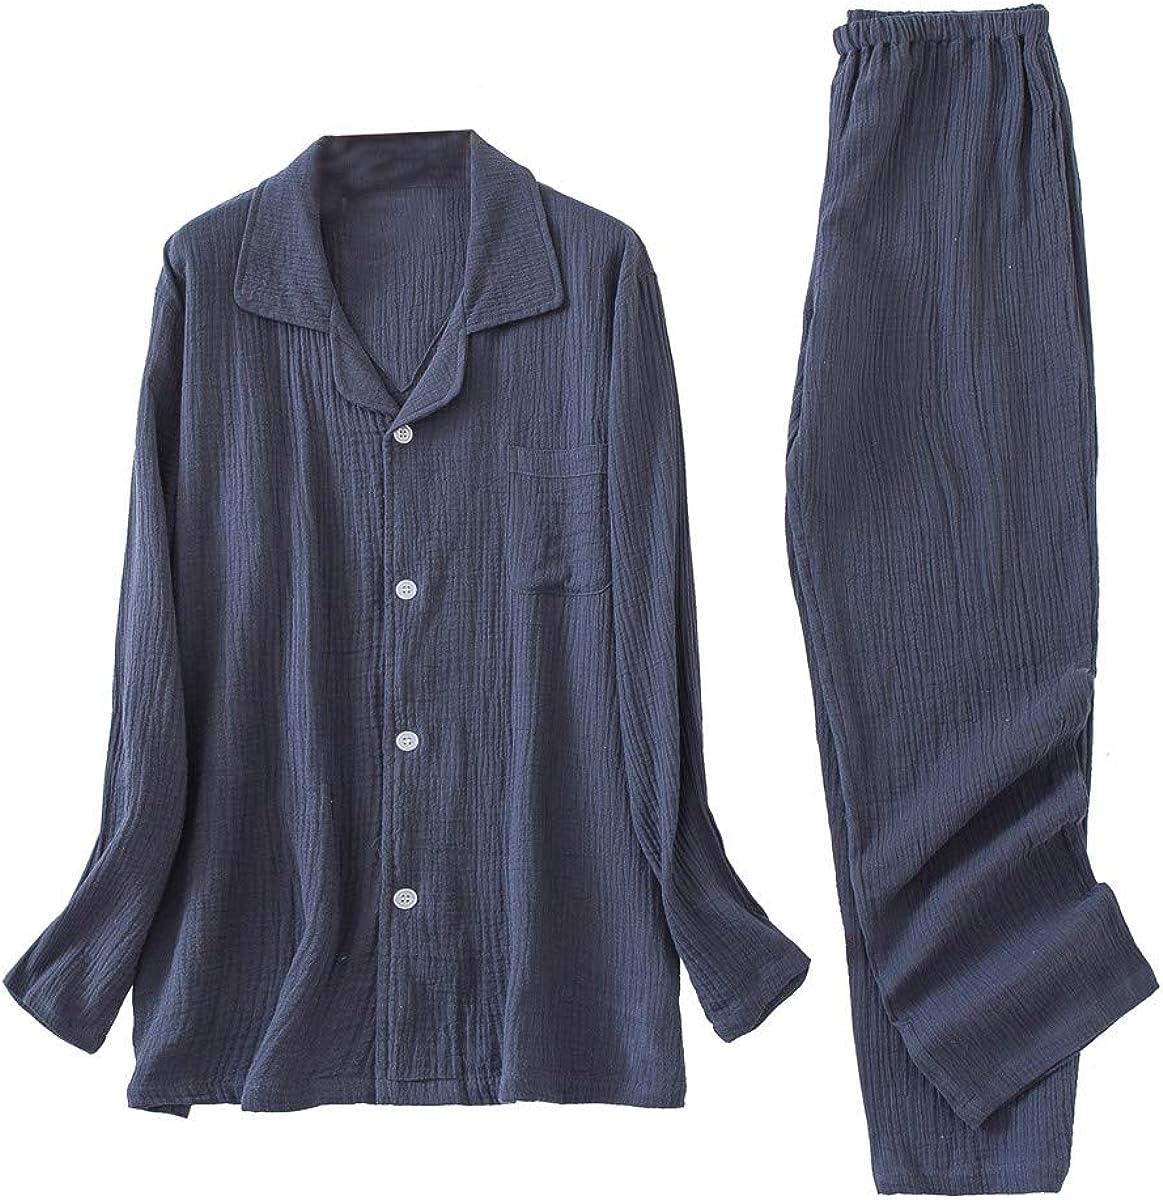 Shanghai Story Doube Sided Crepe Cotton Pajamas Set for Couple Men Women Long-Sleeve Button Down Sleepwear